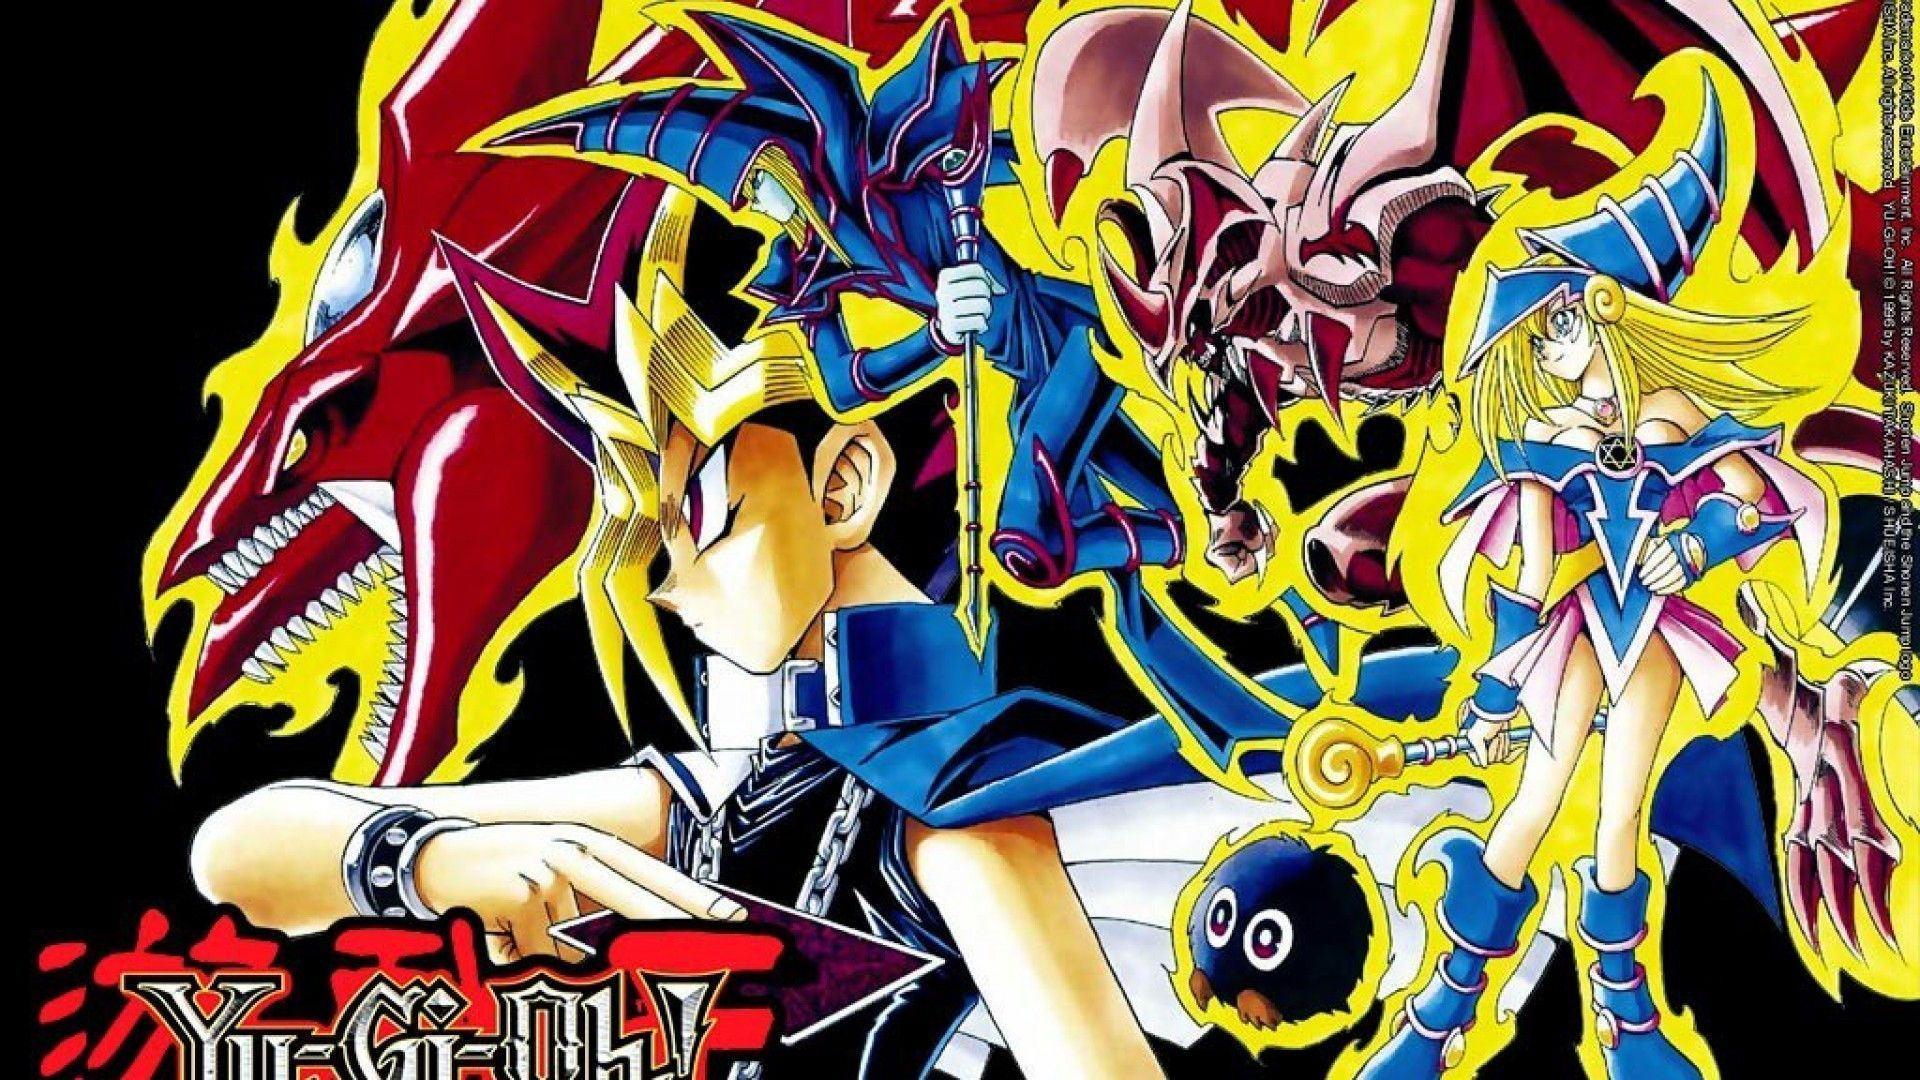 Yugioh Wallpaper HD Free Download Anime Wallpaper